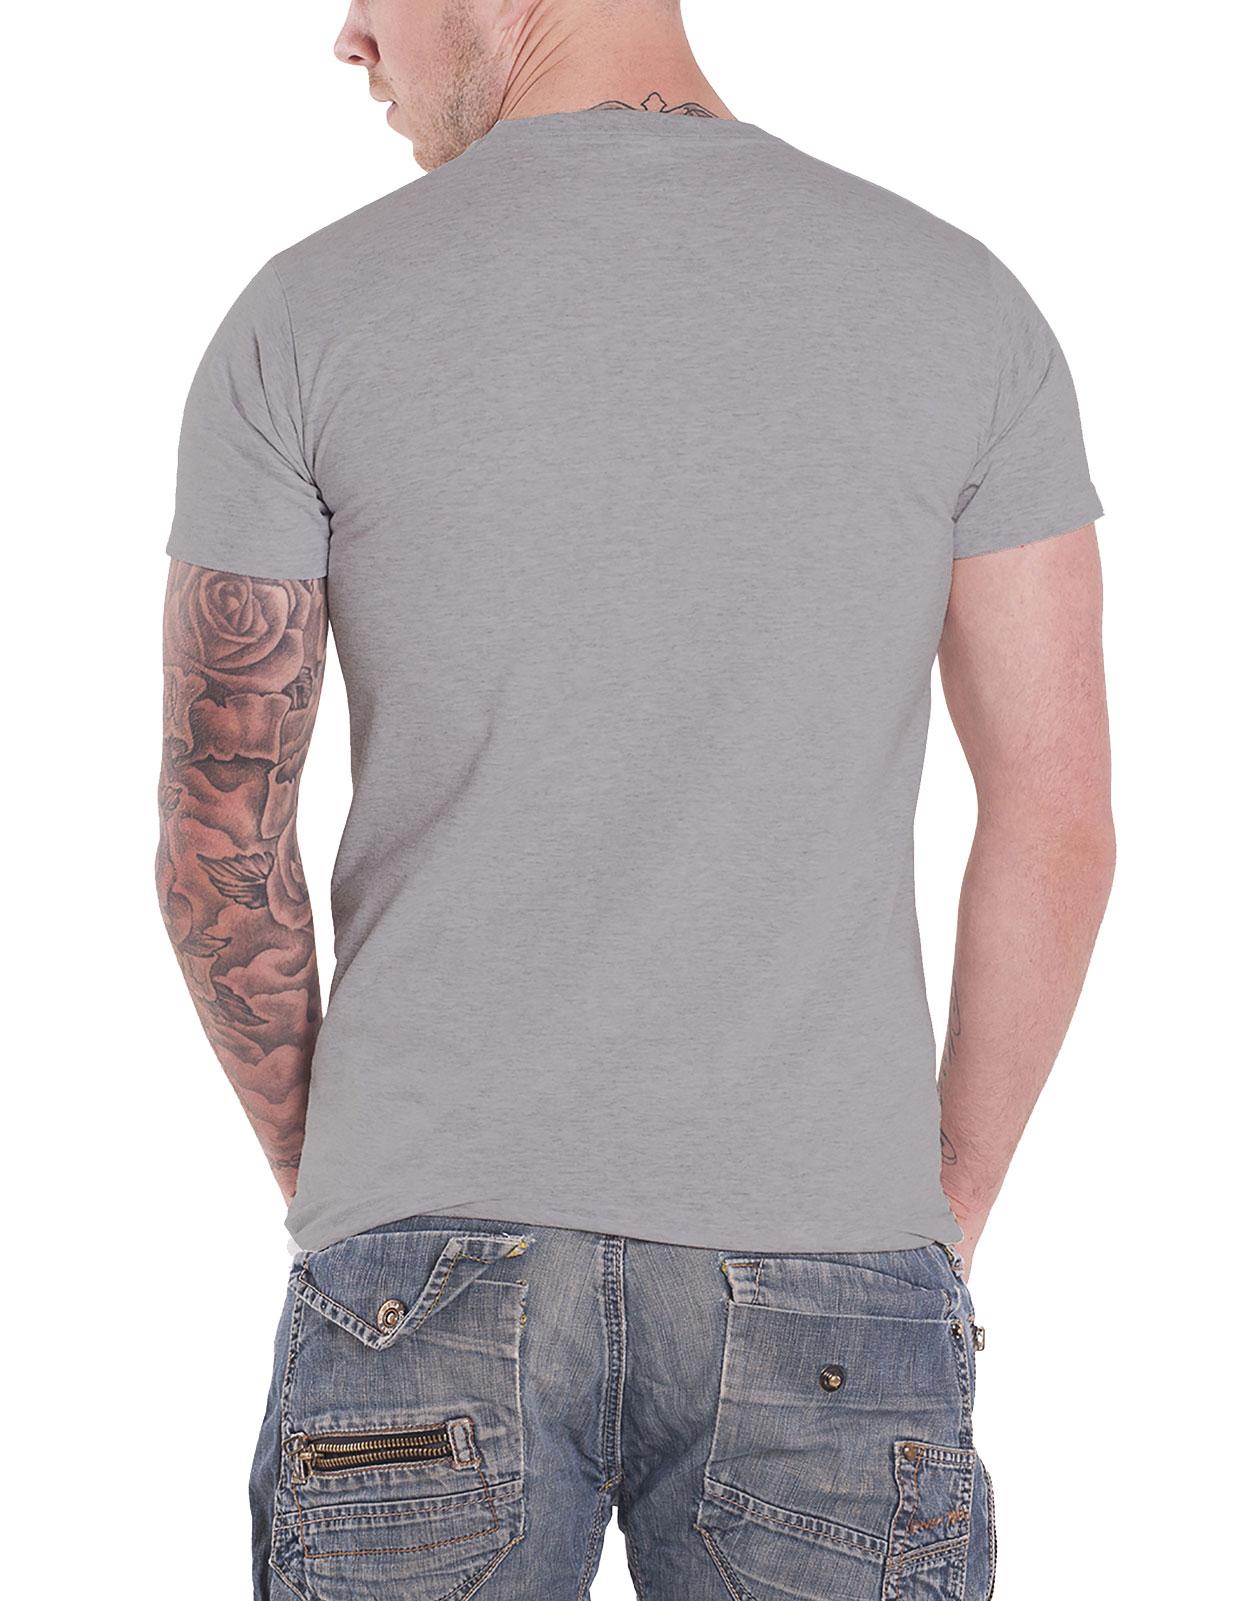 Officiel-Harry-Potter-T-Shirt-Poudlard-Gryffondor-Poufsouffle-cretes-Homme-NEUF miniature 57